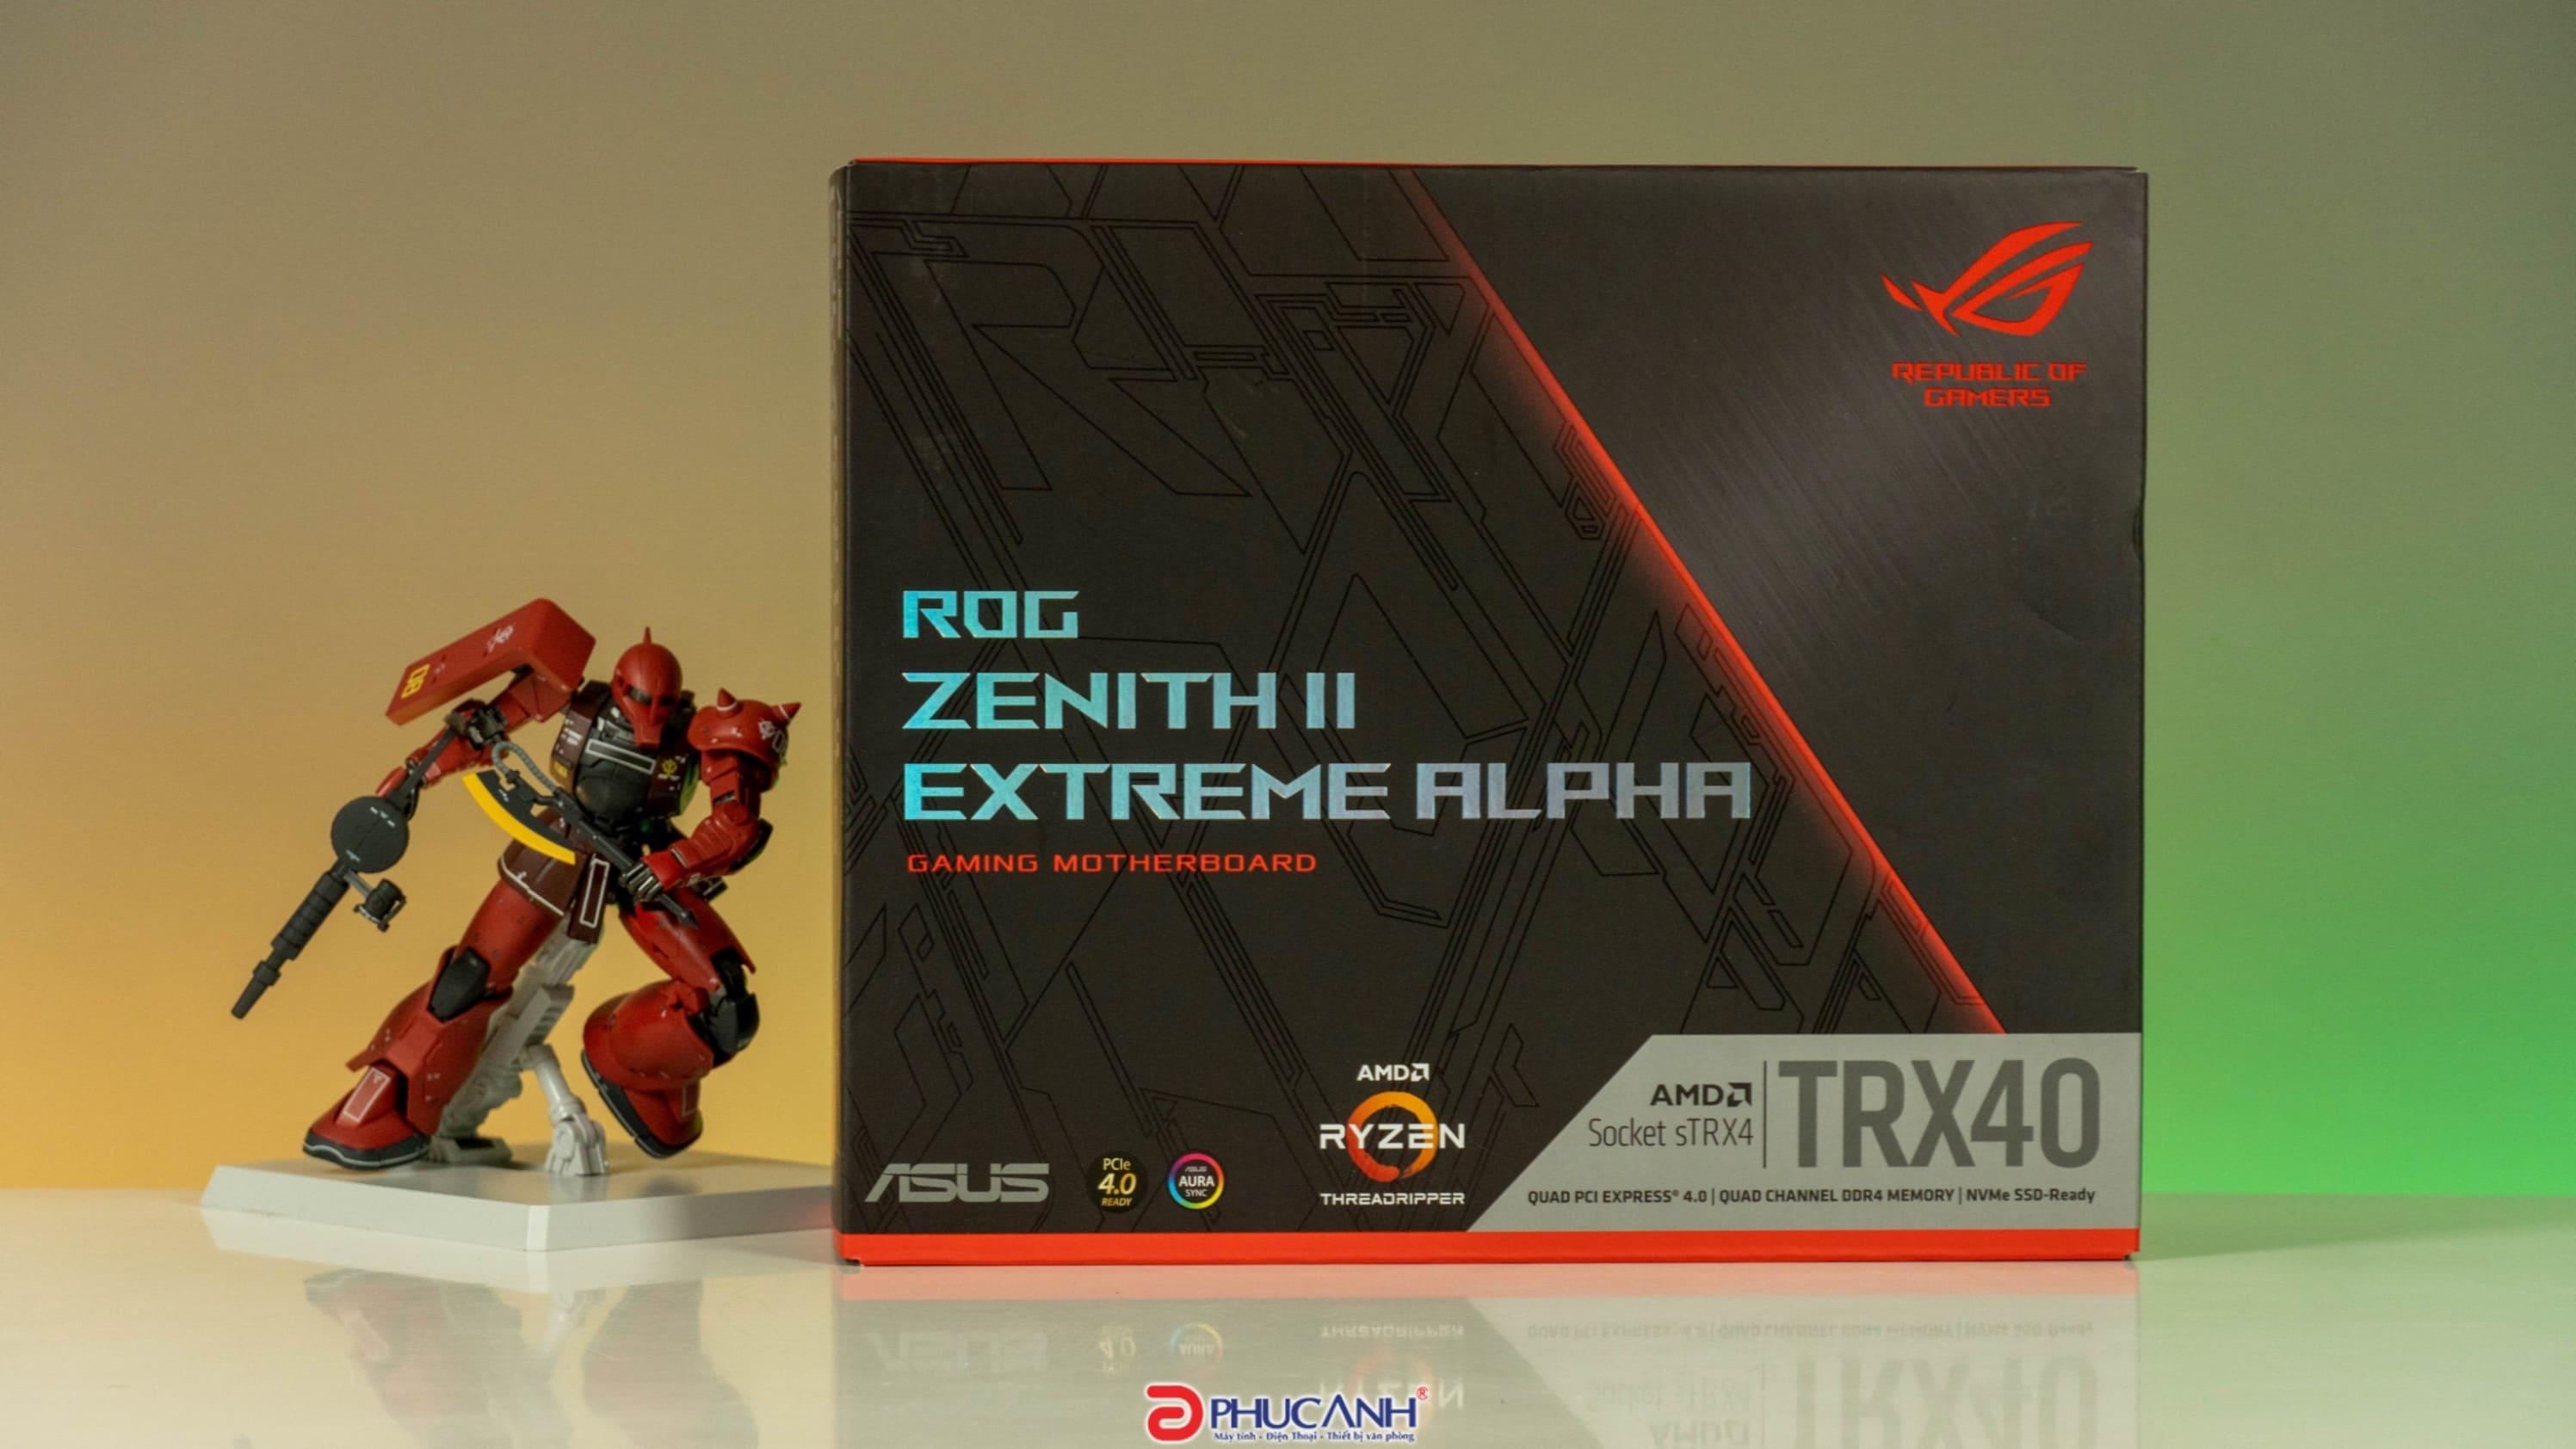 [Unbox] ASUS ROG Zenith II Extreme Alpha - Khai mở toàn bộ hiệu năng của AMD Ryzen Threadripper 3000 Series